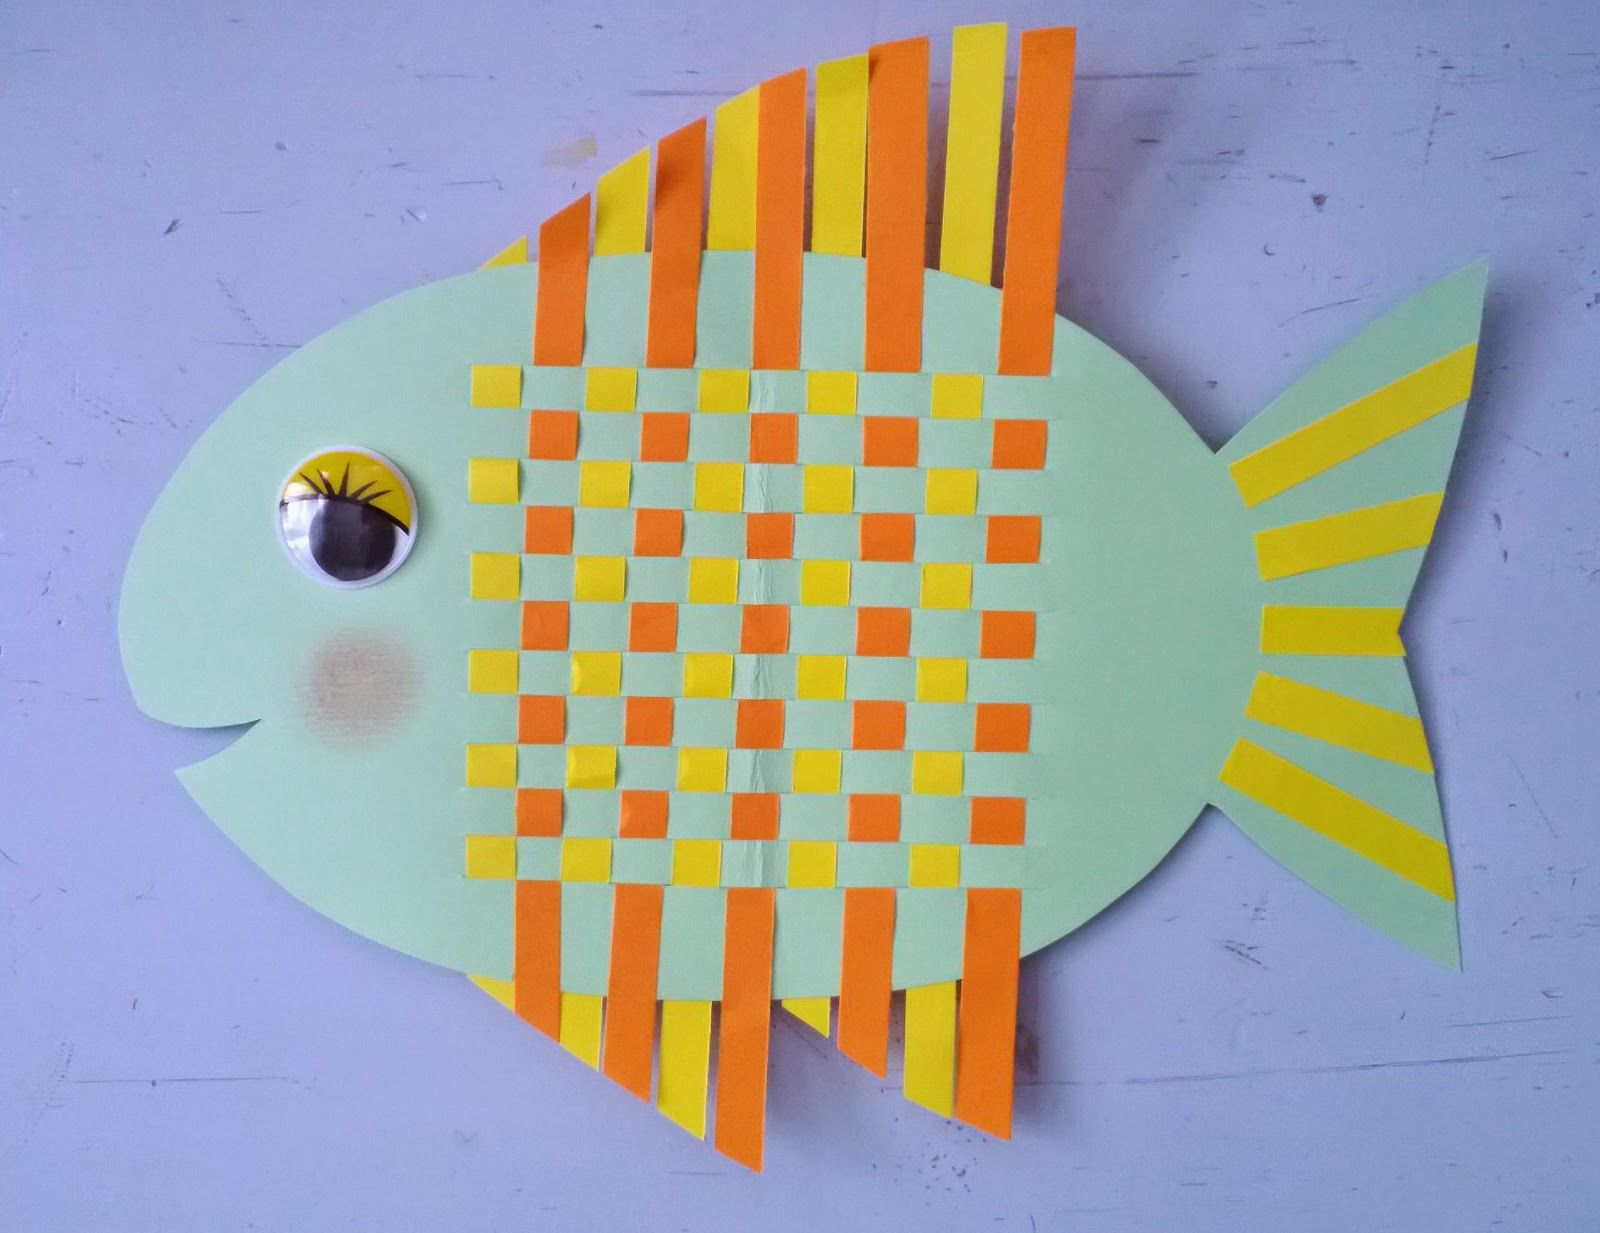 poisson tissage papier kinderknutseldingen pinterest. Black Bedroom Furniture Sets. Home Design Ideas